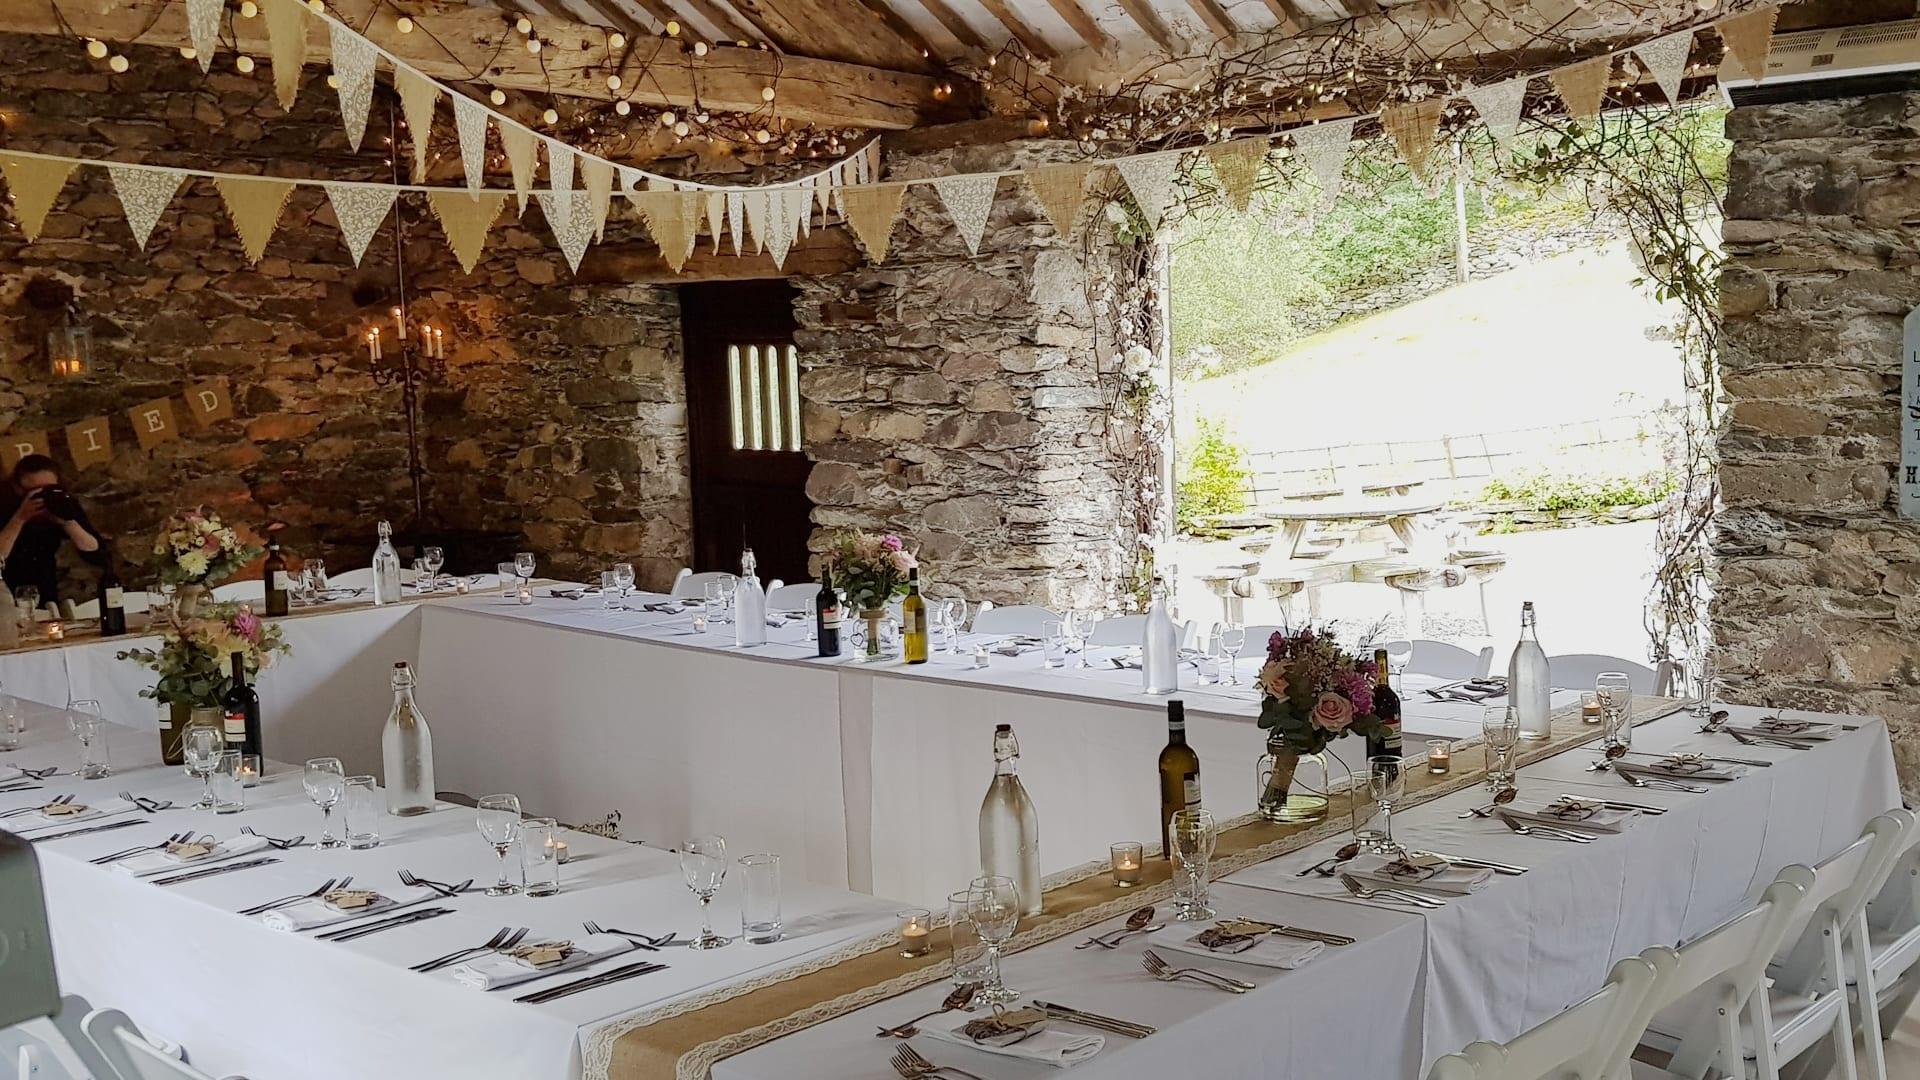 Rustic Barn Wedding Breakfast Set Up